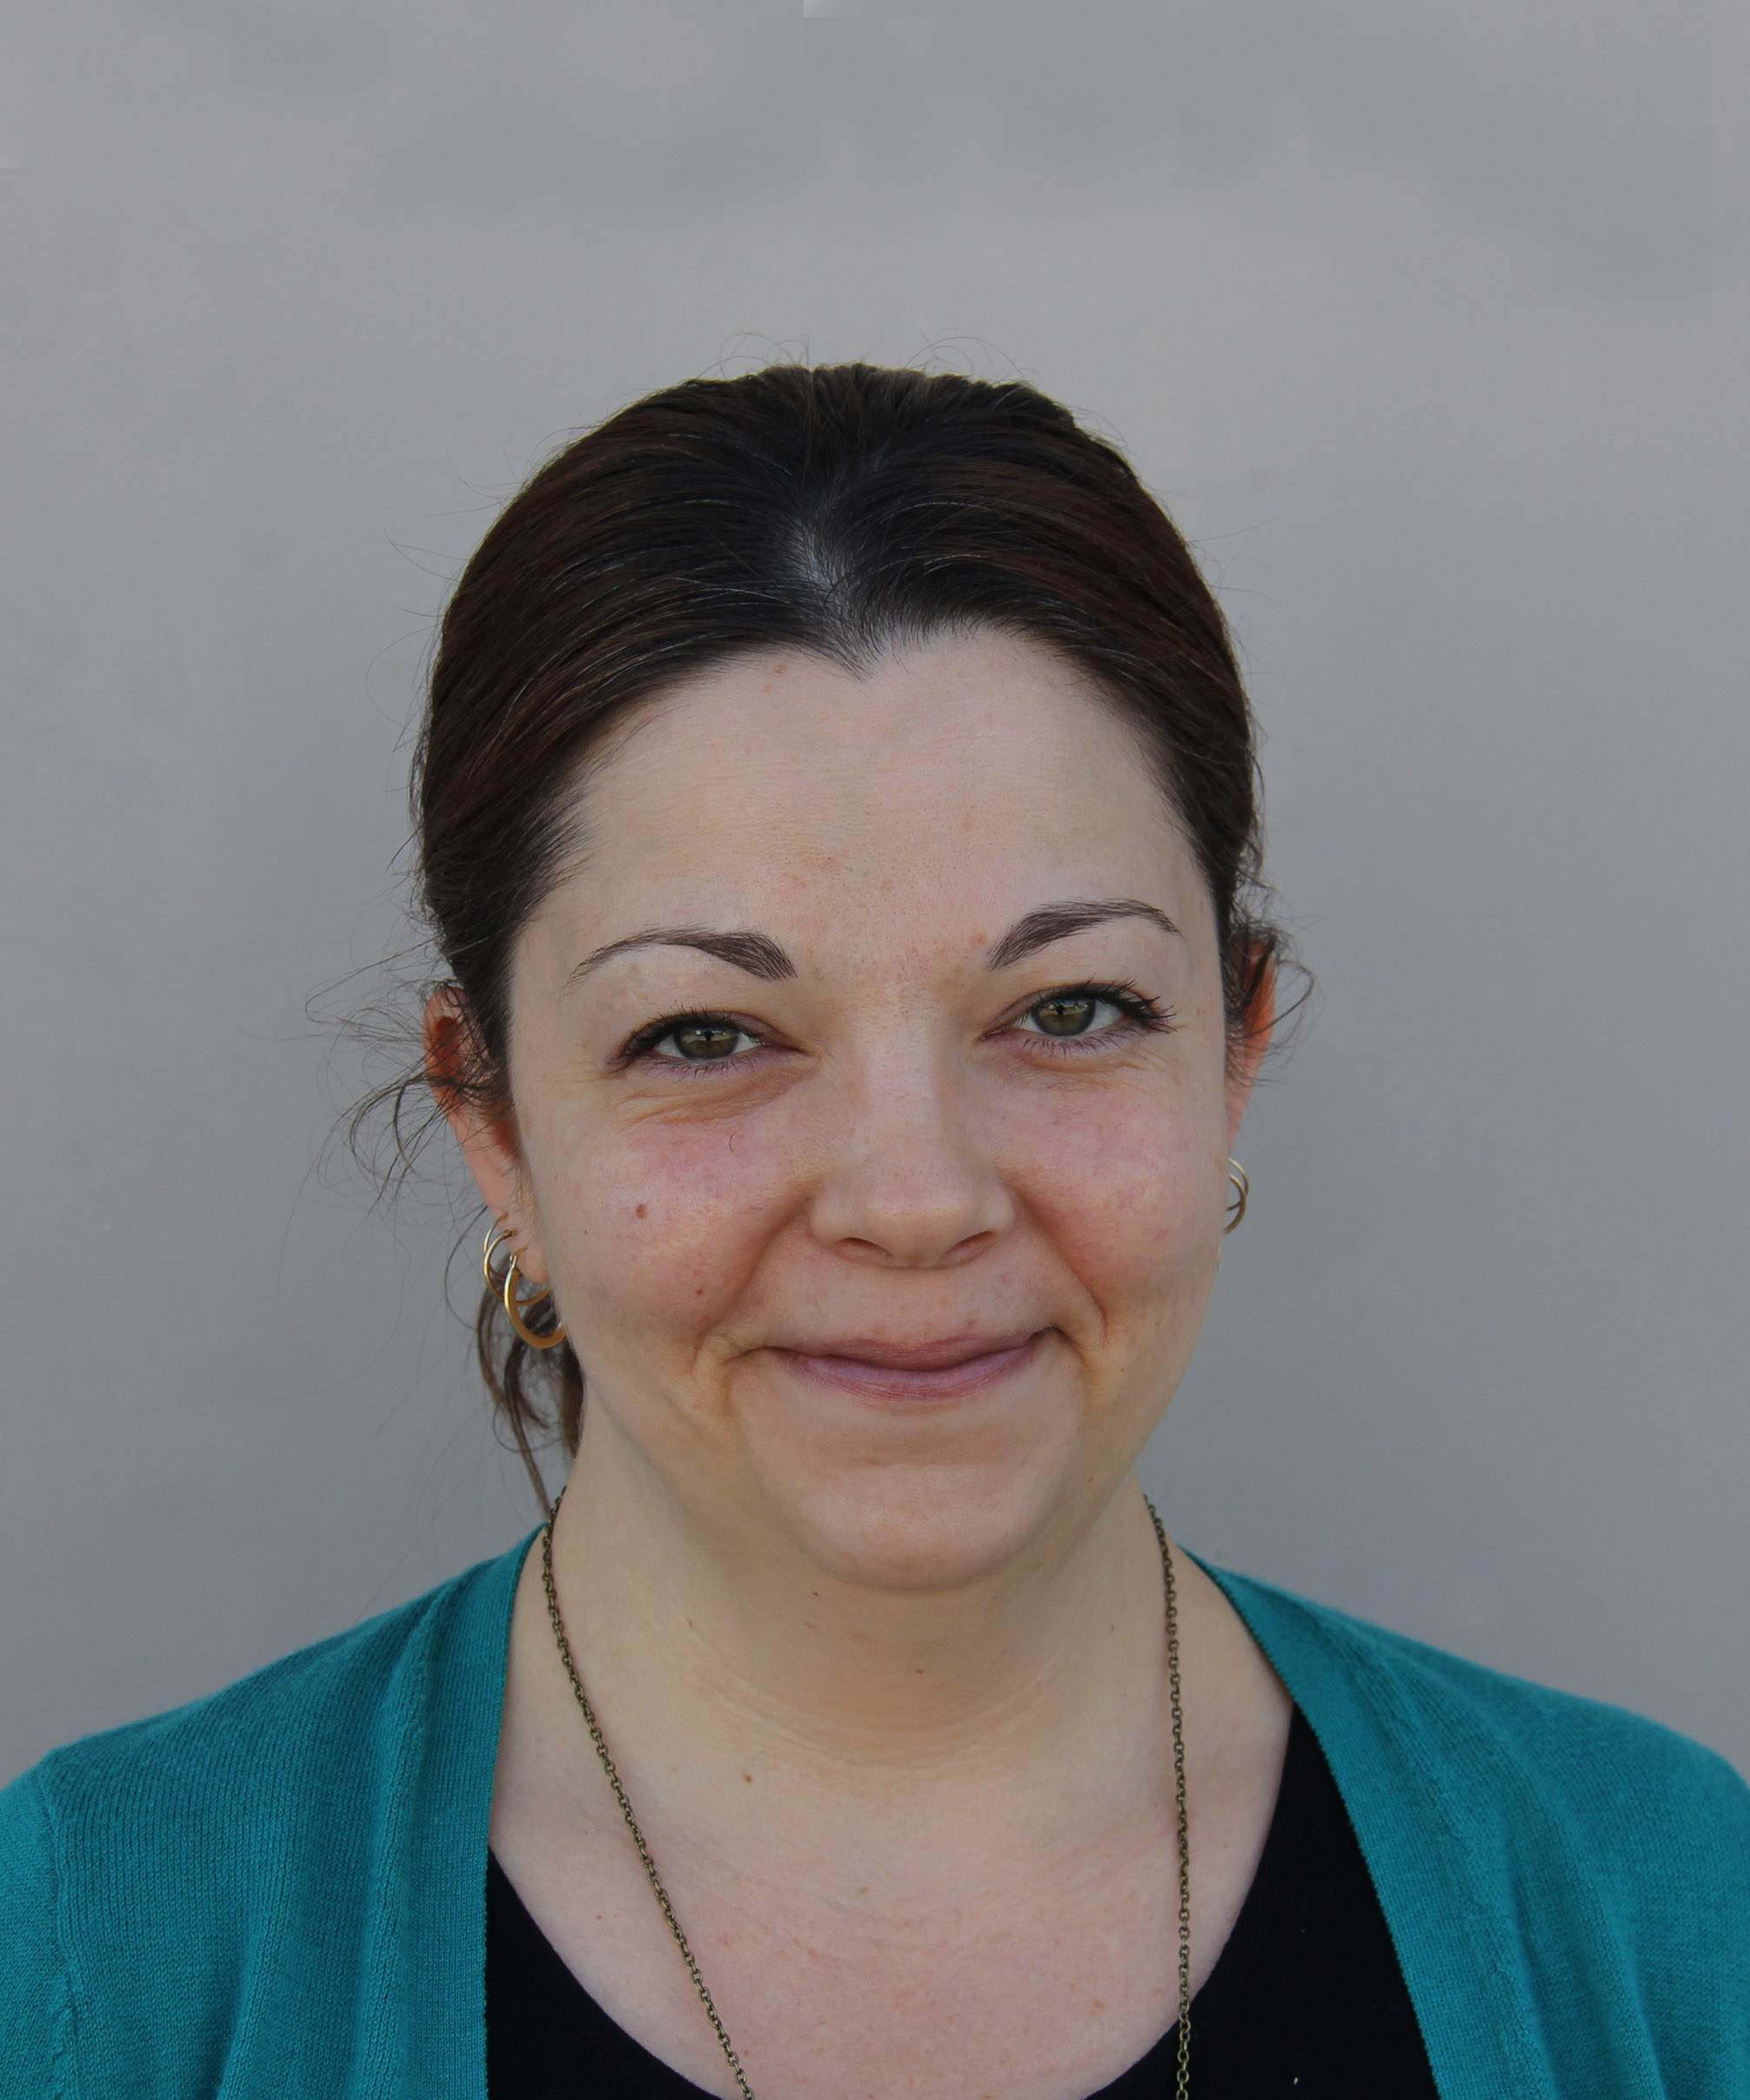 Jennifer McLaughlin